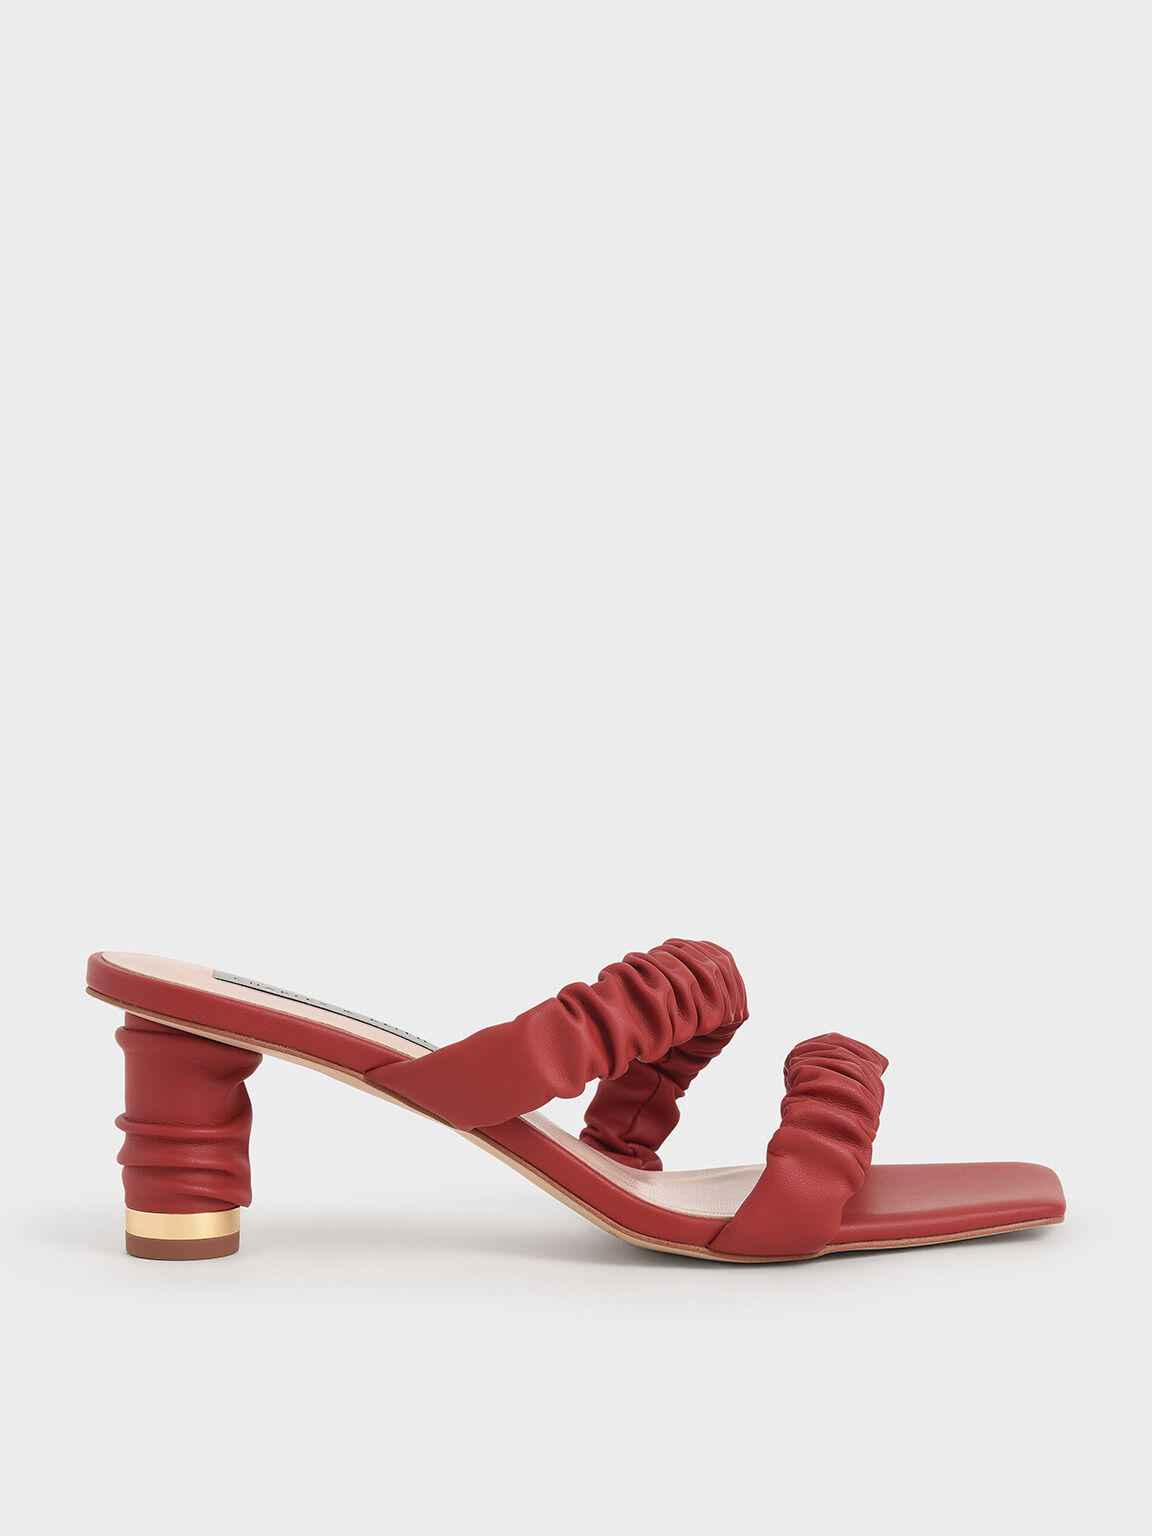 皺褶雙帶拖鞋, 紅色, hi-res